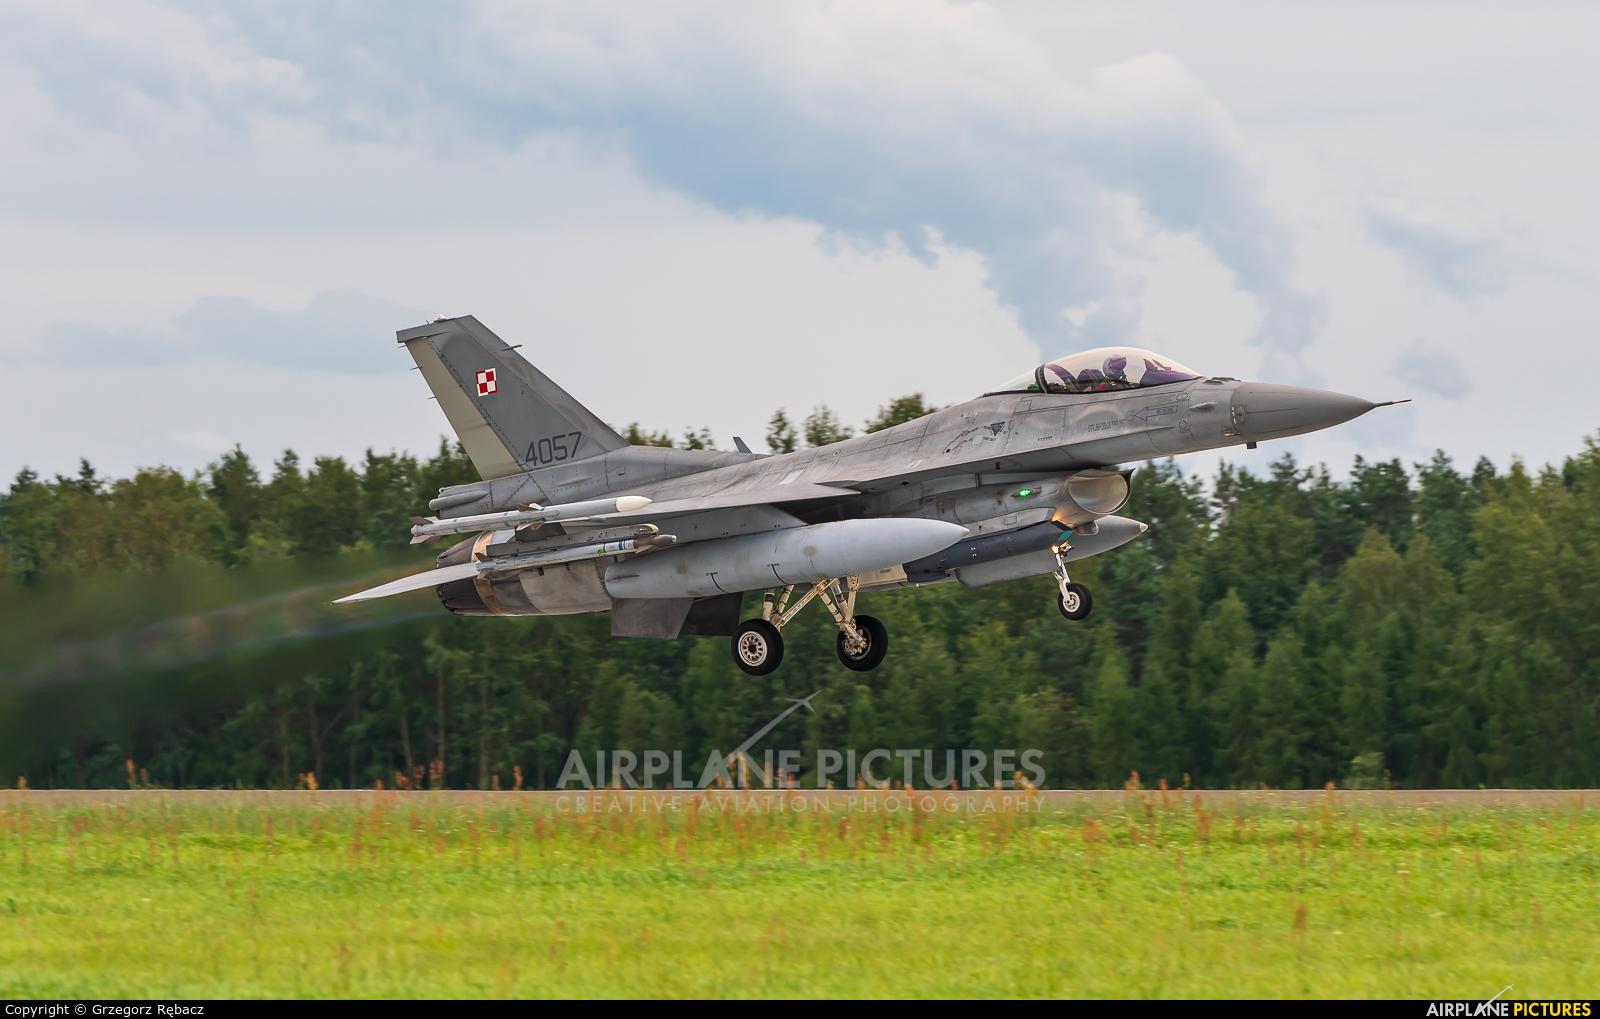 Poland - Air Force 4057 aircraft at Łask AB